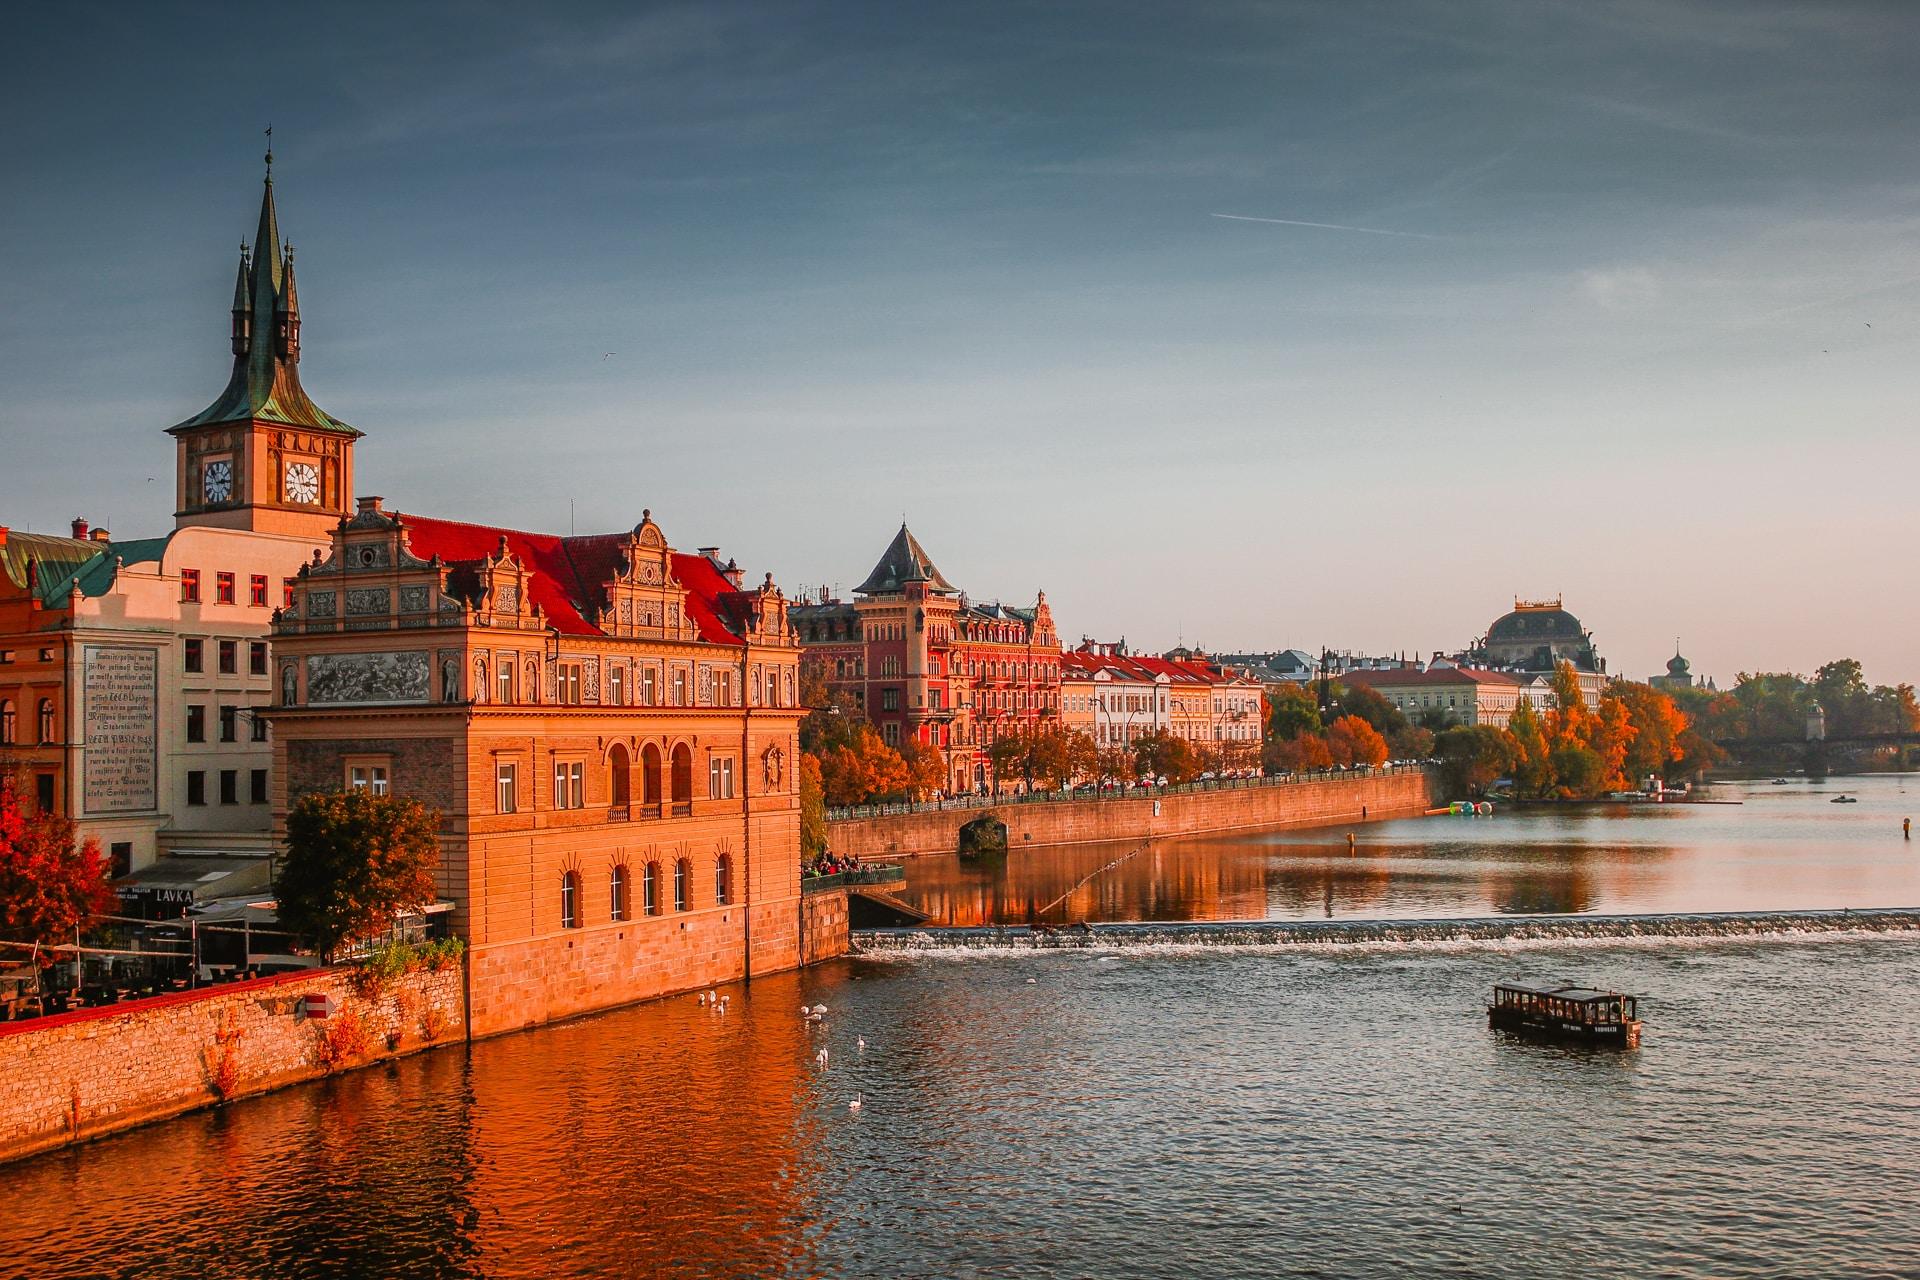 rodrigo ardilha WAPFd4fMy2o unsplash The Top 7 European Destinations to Get an Adventure of a Lifetime